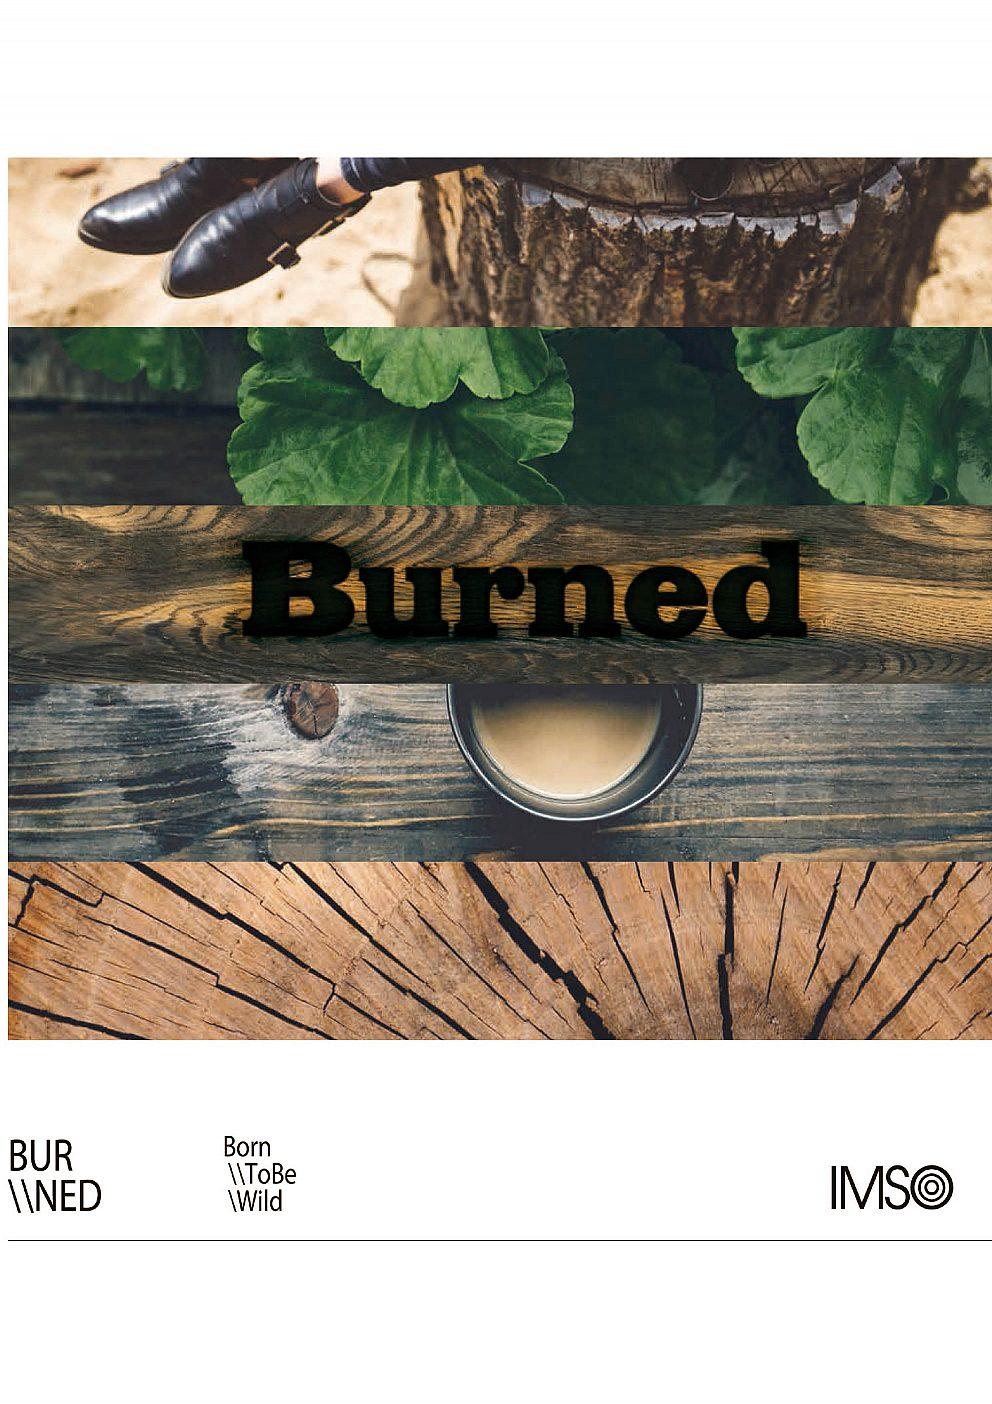 Imso - Burned